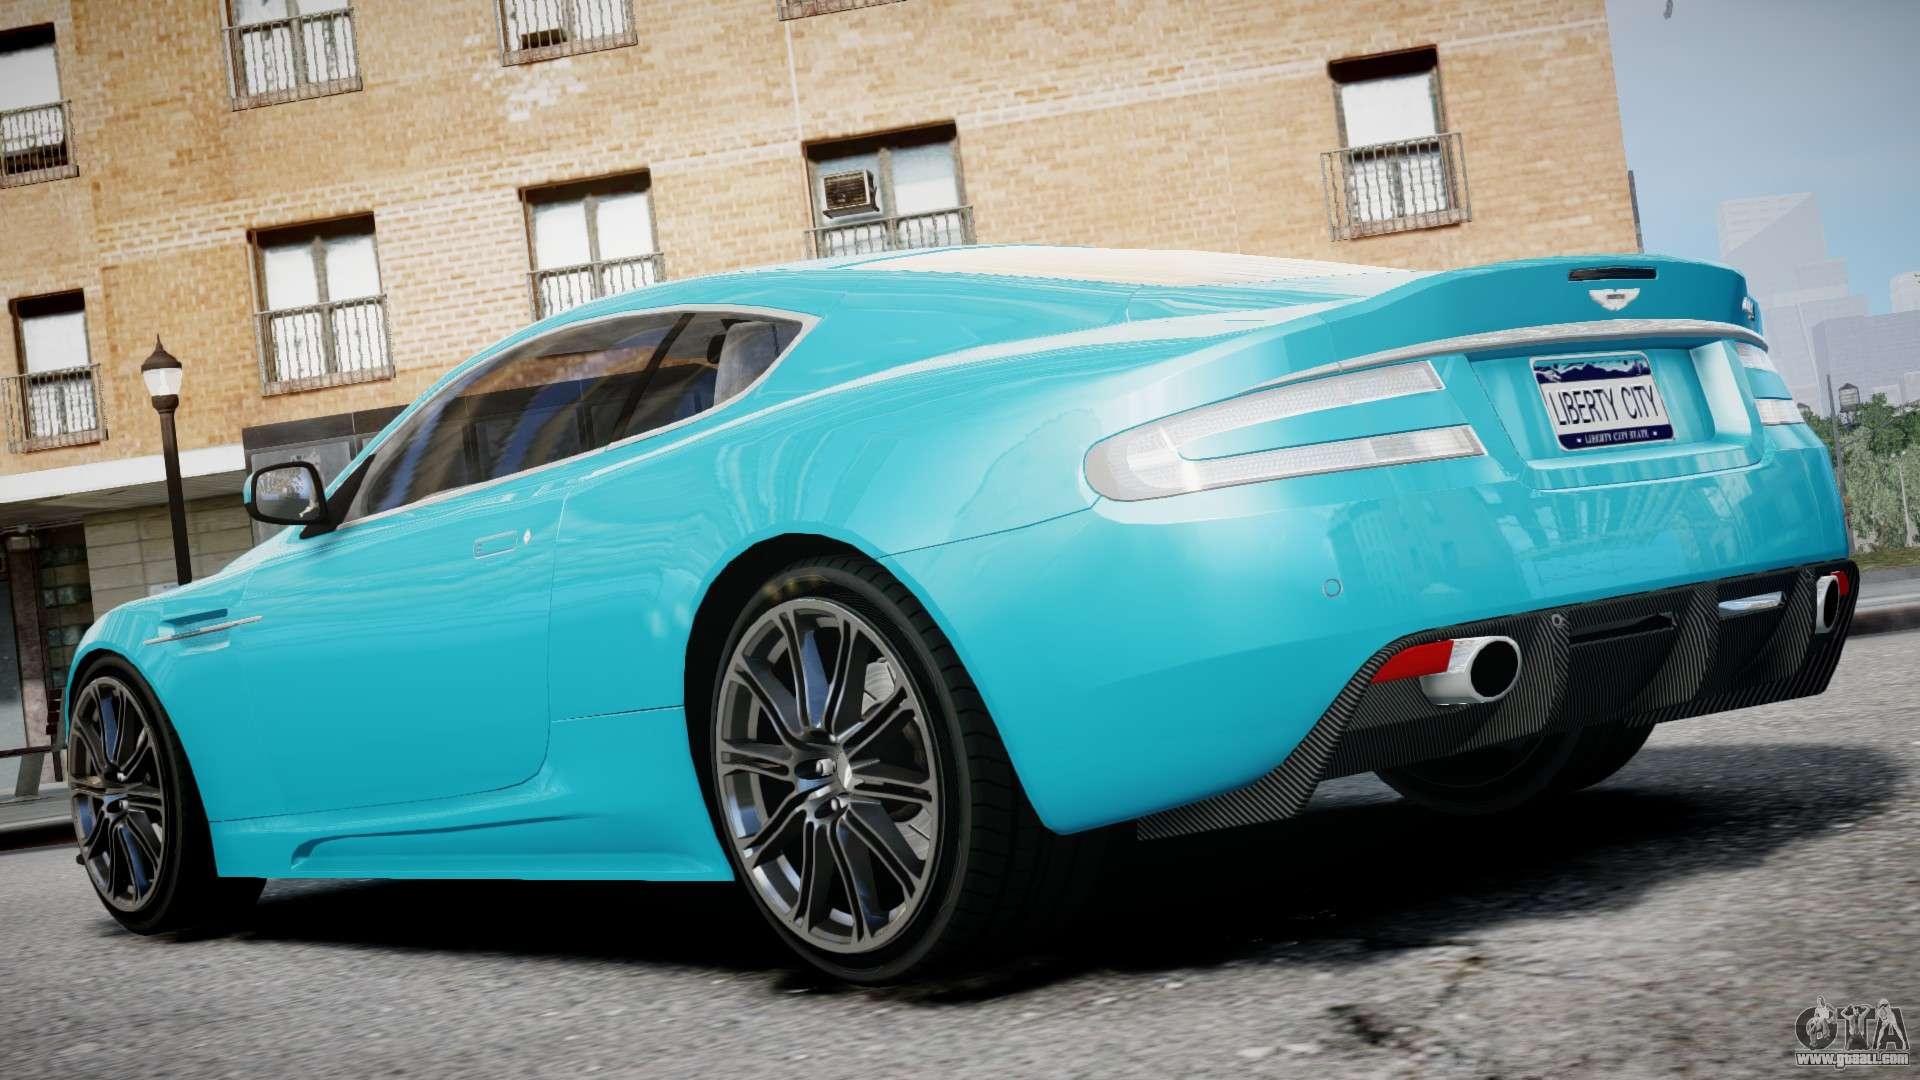 Aston Martin Washington Dc News Of New Car - Aston martin washington dc